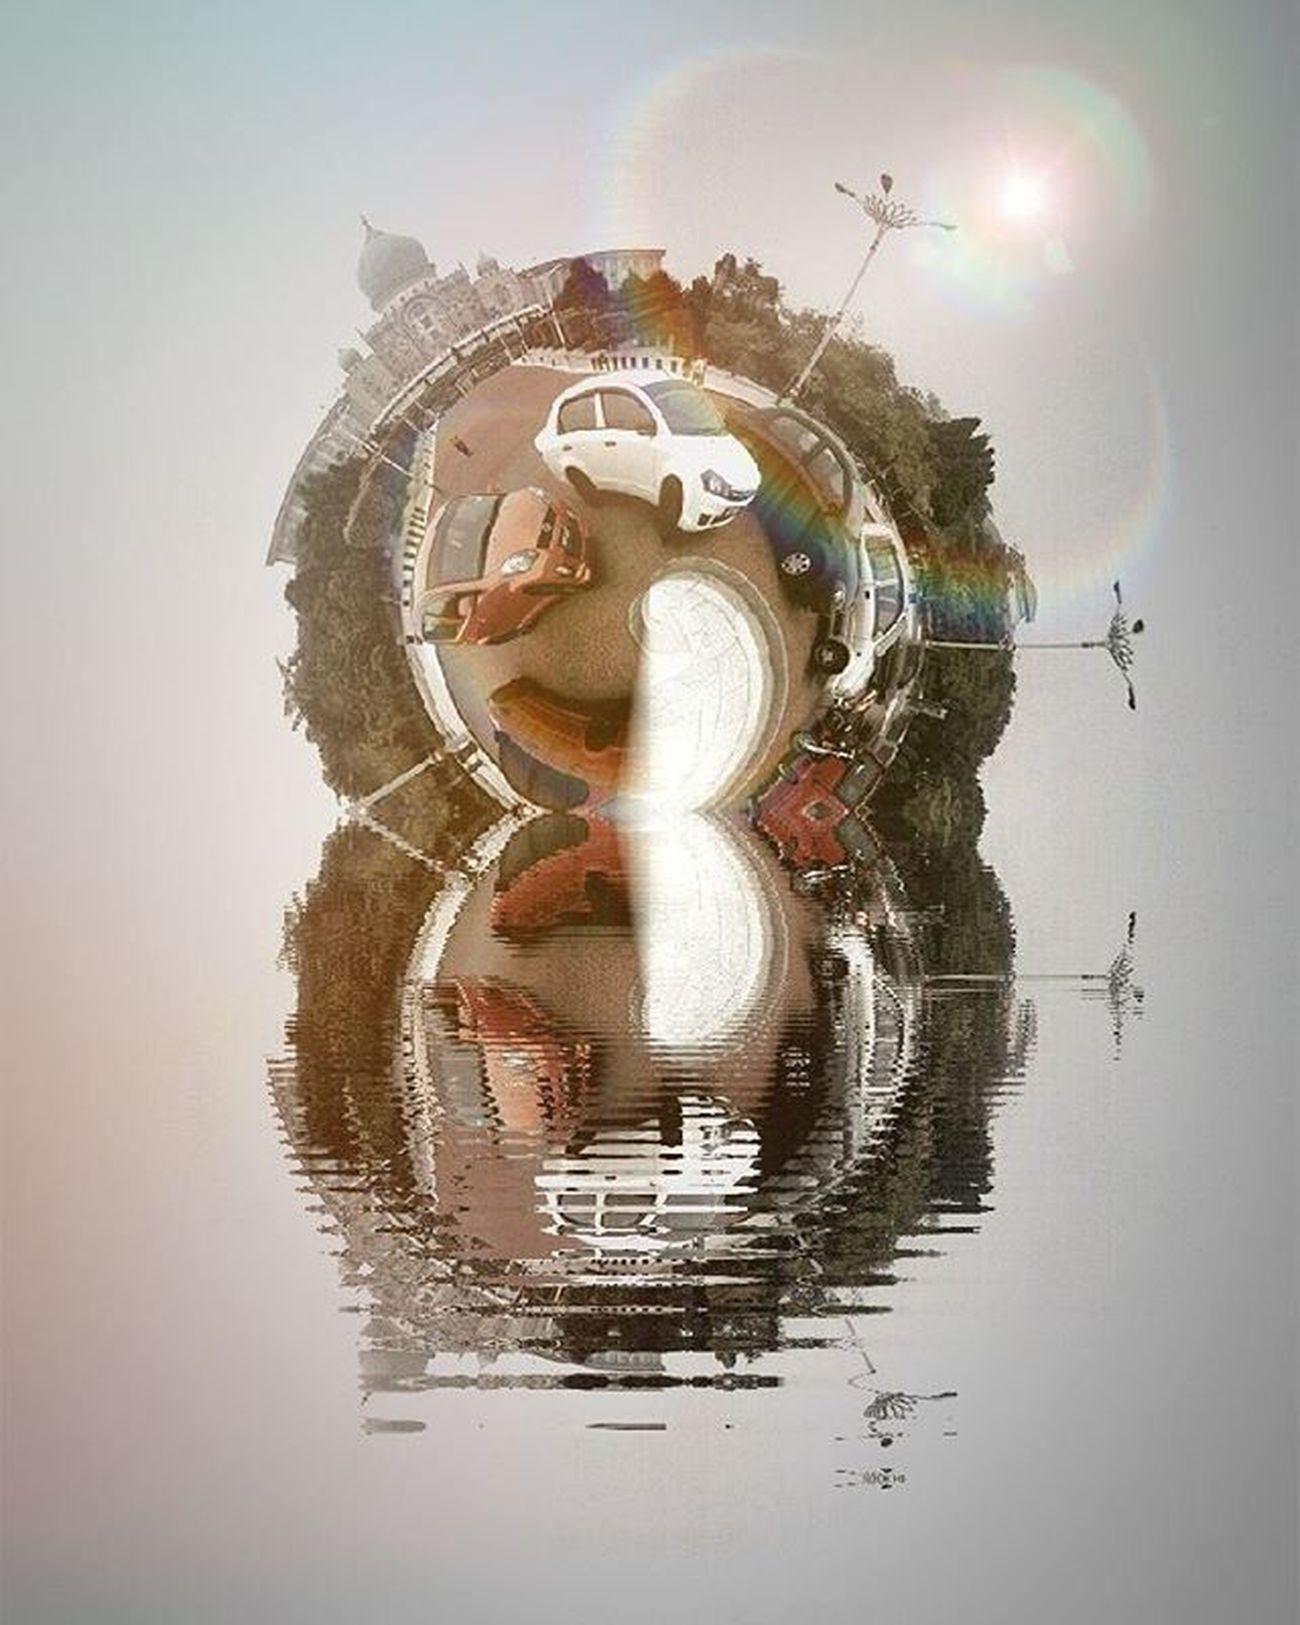 Is this the real life? Is this just fantasy? WHPmakebelieve Tinyplanet Reflection Puddle Fantasy Putrajaya Makebelieve Htcone HTCOneM7 HTC Gadgetgrapher Phoneedit Merging Surface Up Jalanjalansore Jalanjalanmen JJS